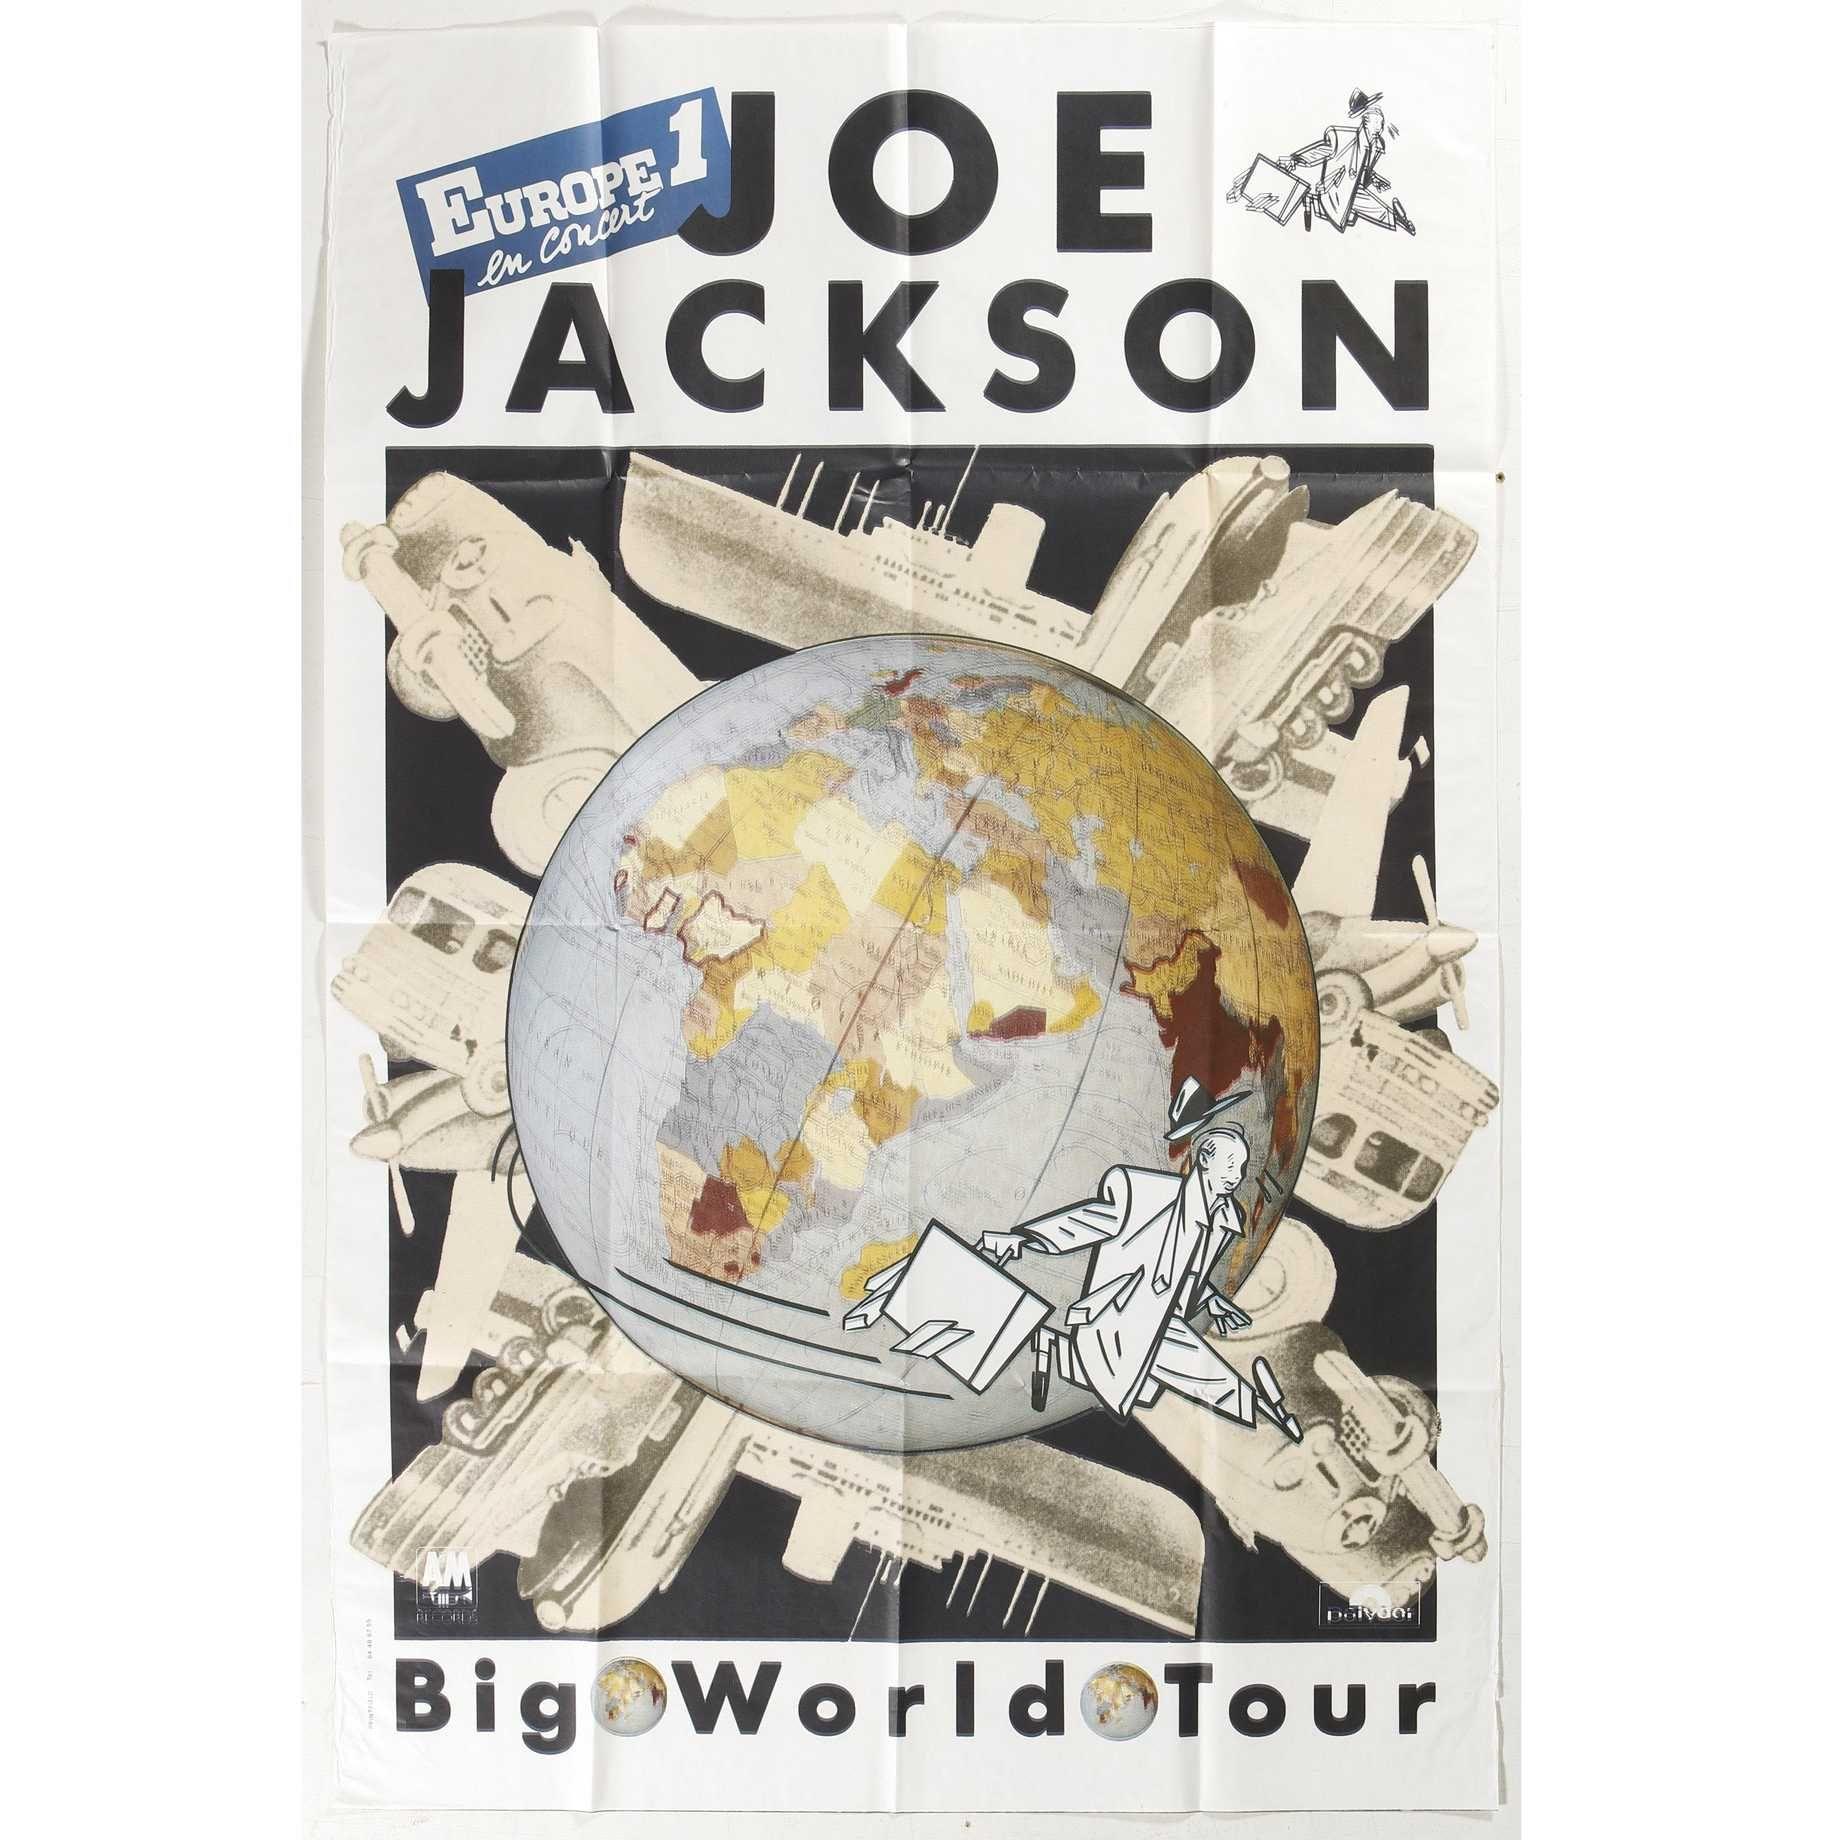 ANONYME. Joe Jackson en concert. Offset Jackson, Concert